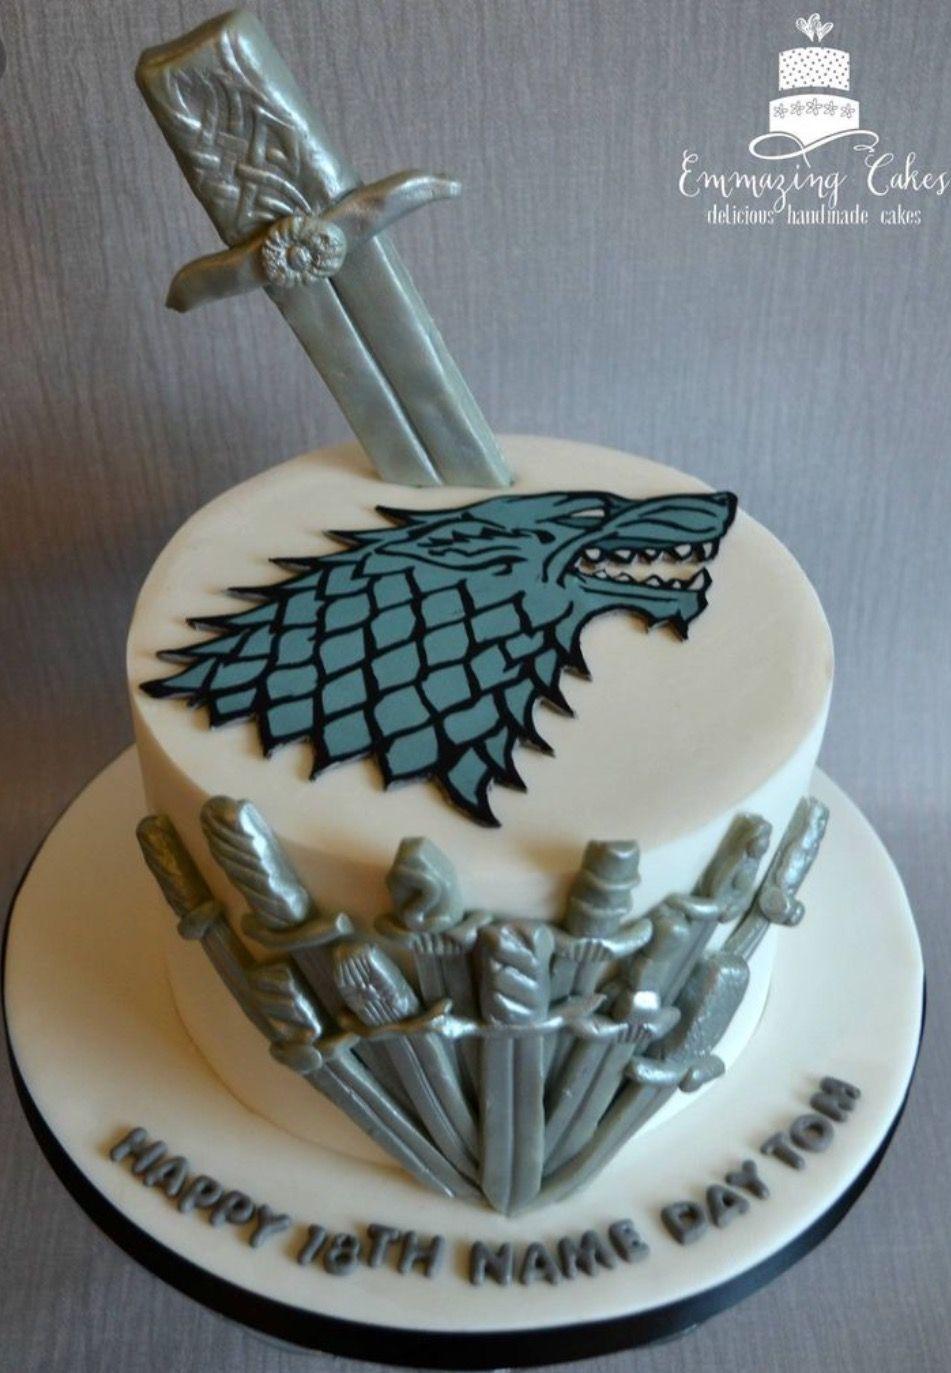 Pin by Cheri Cavanaugh on Cakes Pinterest Cake Amazing cakes